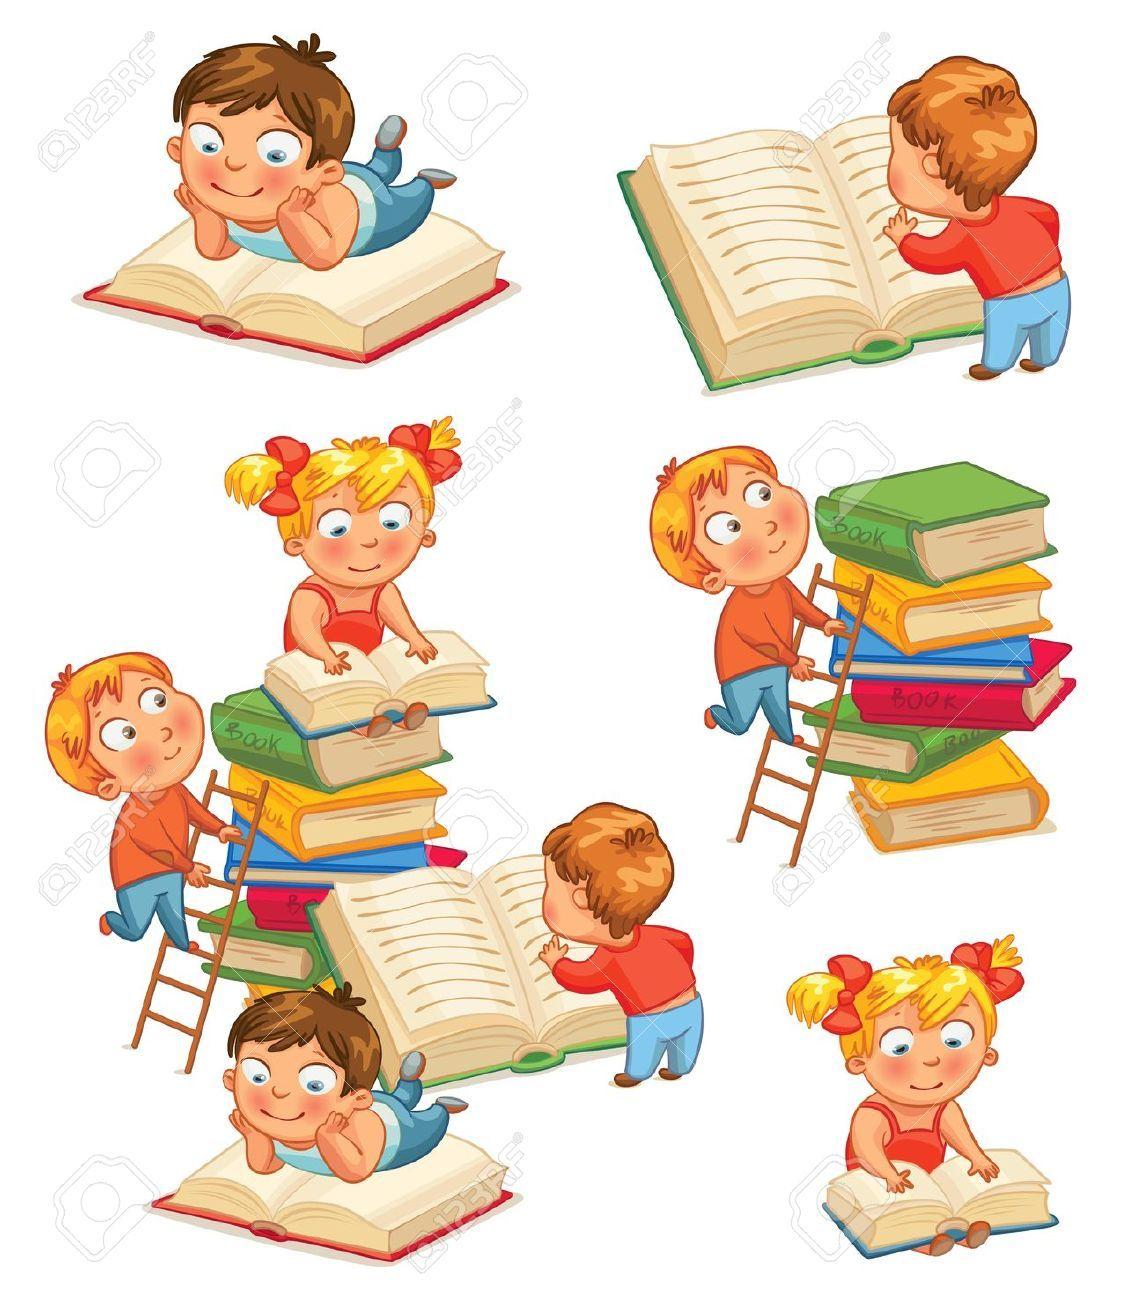 Top Cartoon Children Reading images | reading | Pinterest DK76